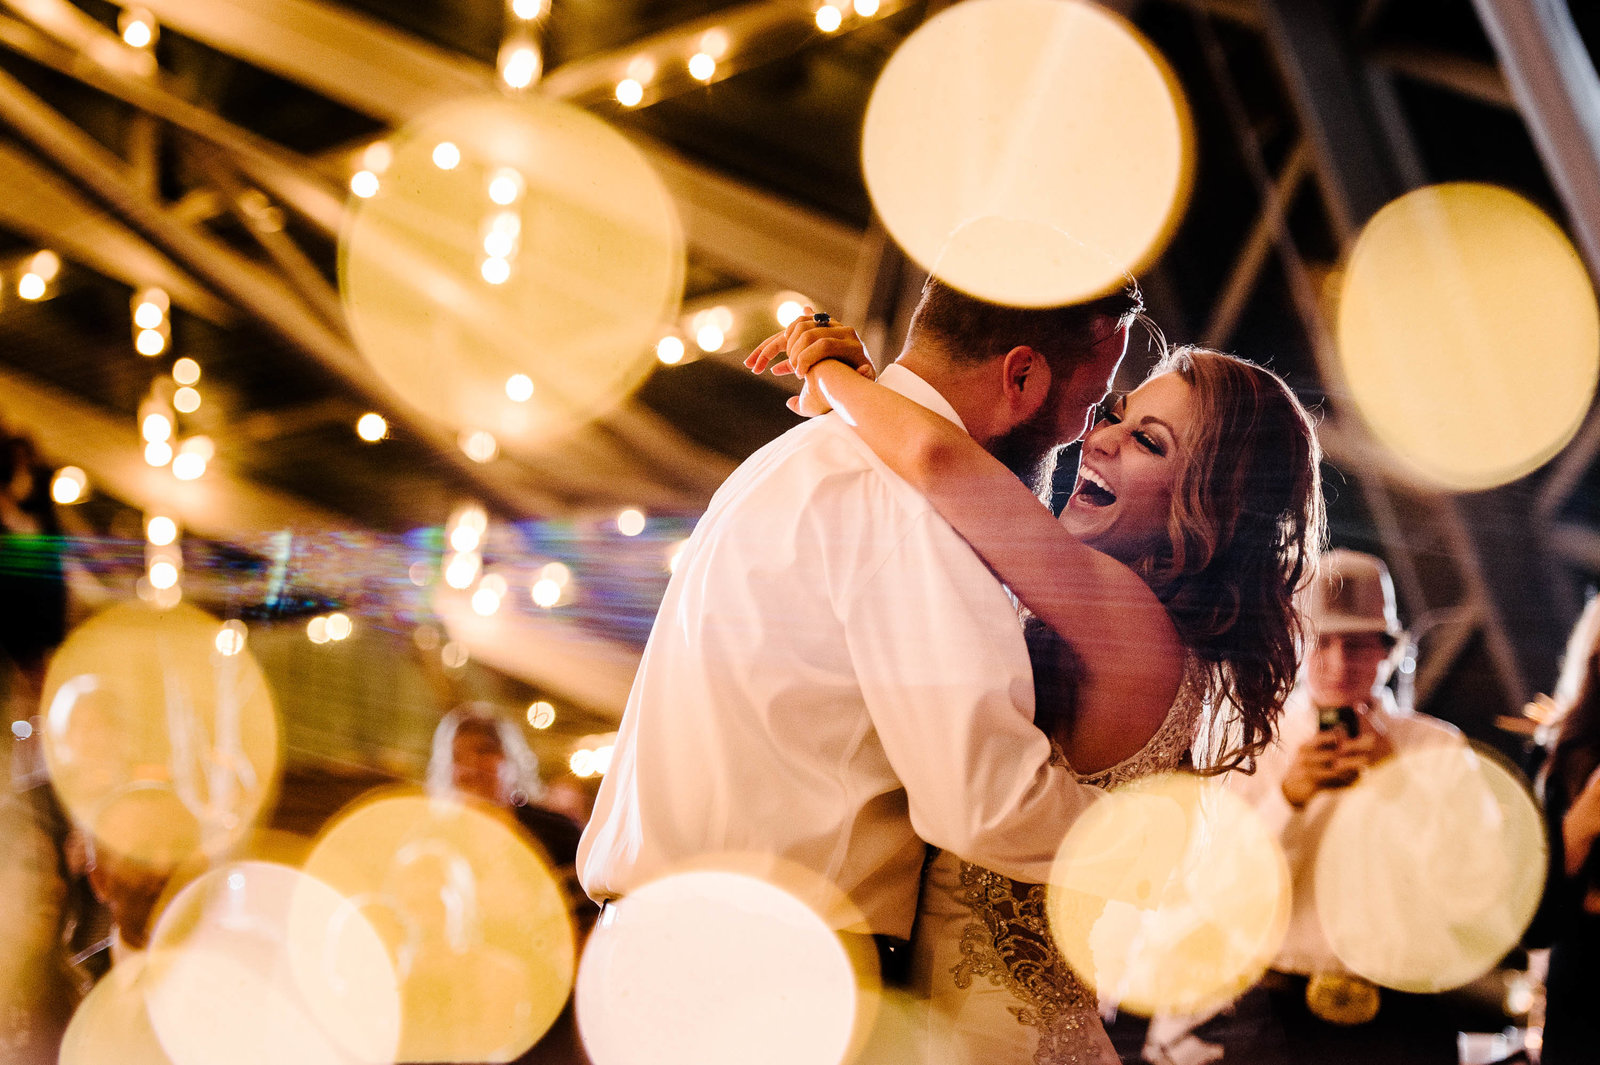 145-El-paso-wedding-photographer-ArKe_0918